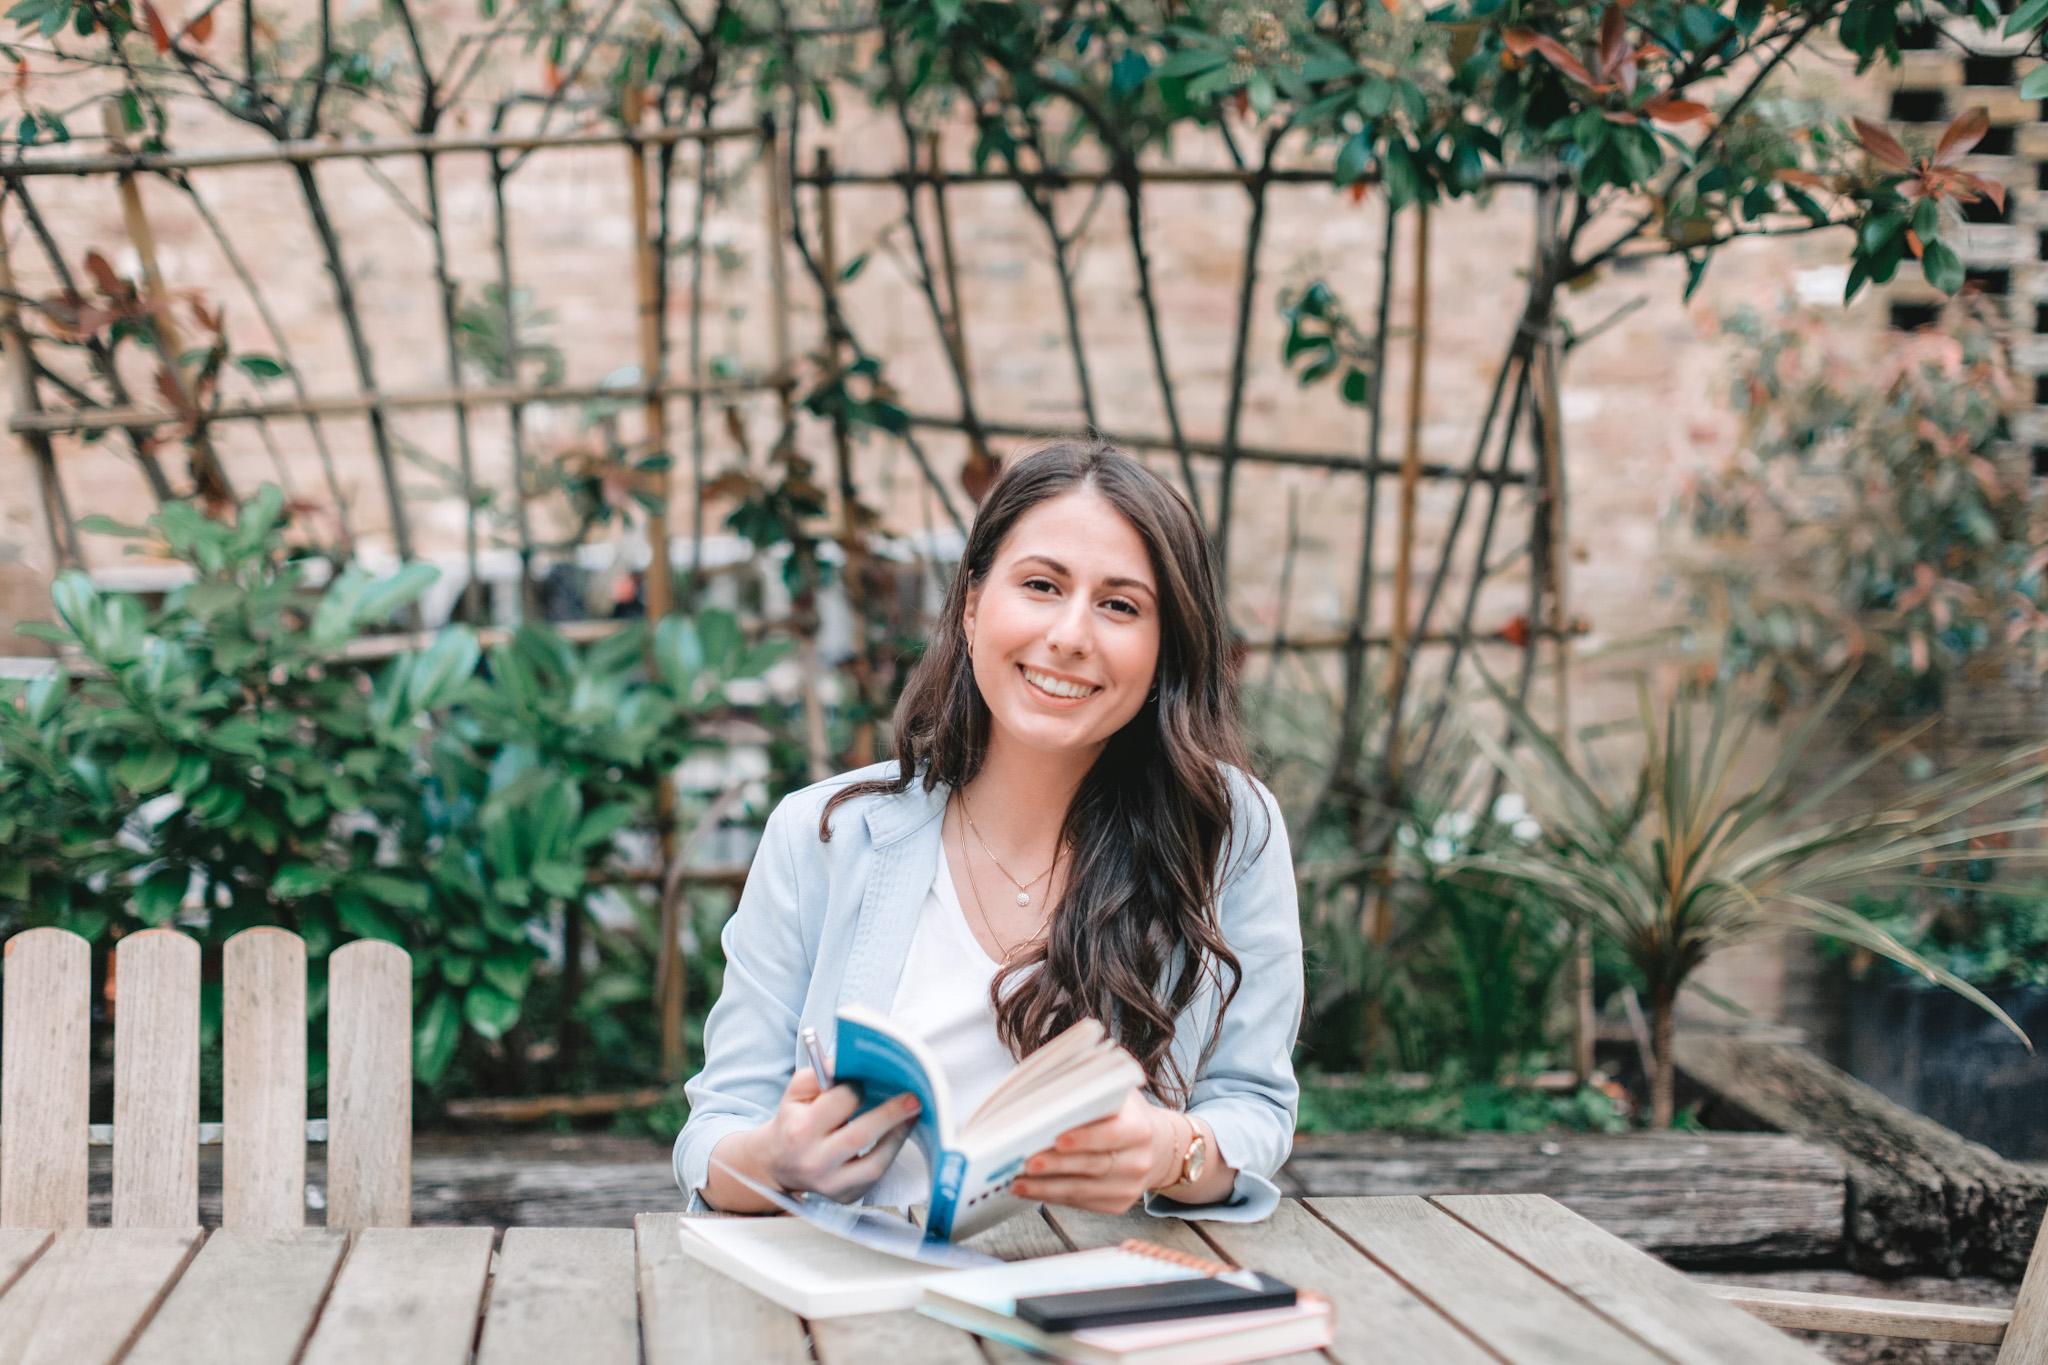 6-Andrea-Prodan-Coaching_Branding-and-Lifestyle-Photo-Session_London_2019_Joana-Senkute-Photography PERSONAL GROWTH